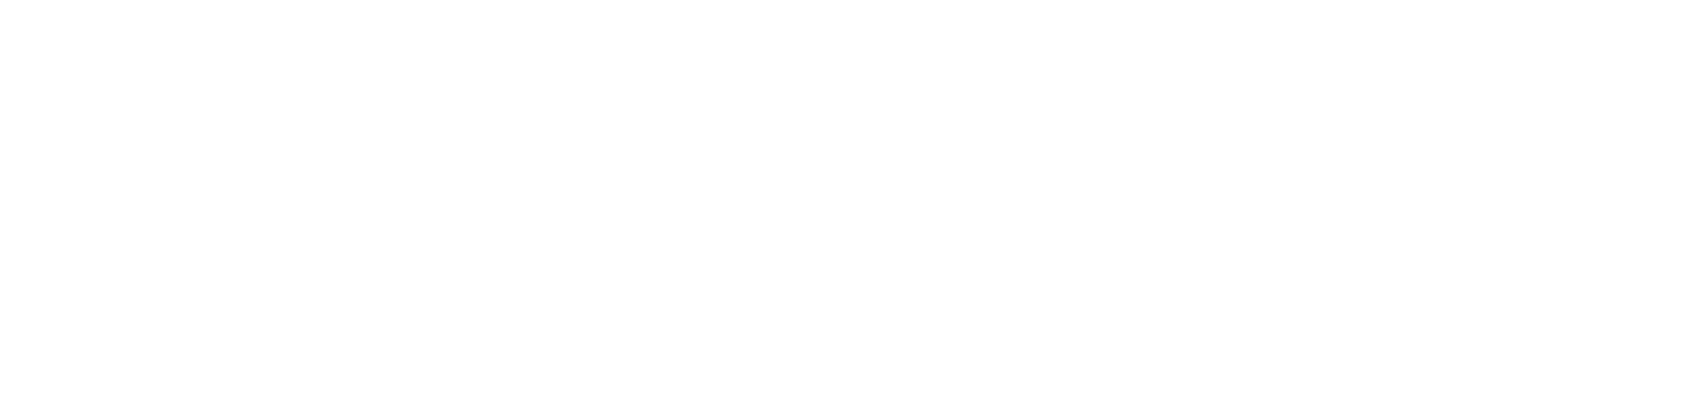 decided-1